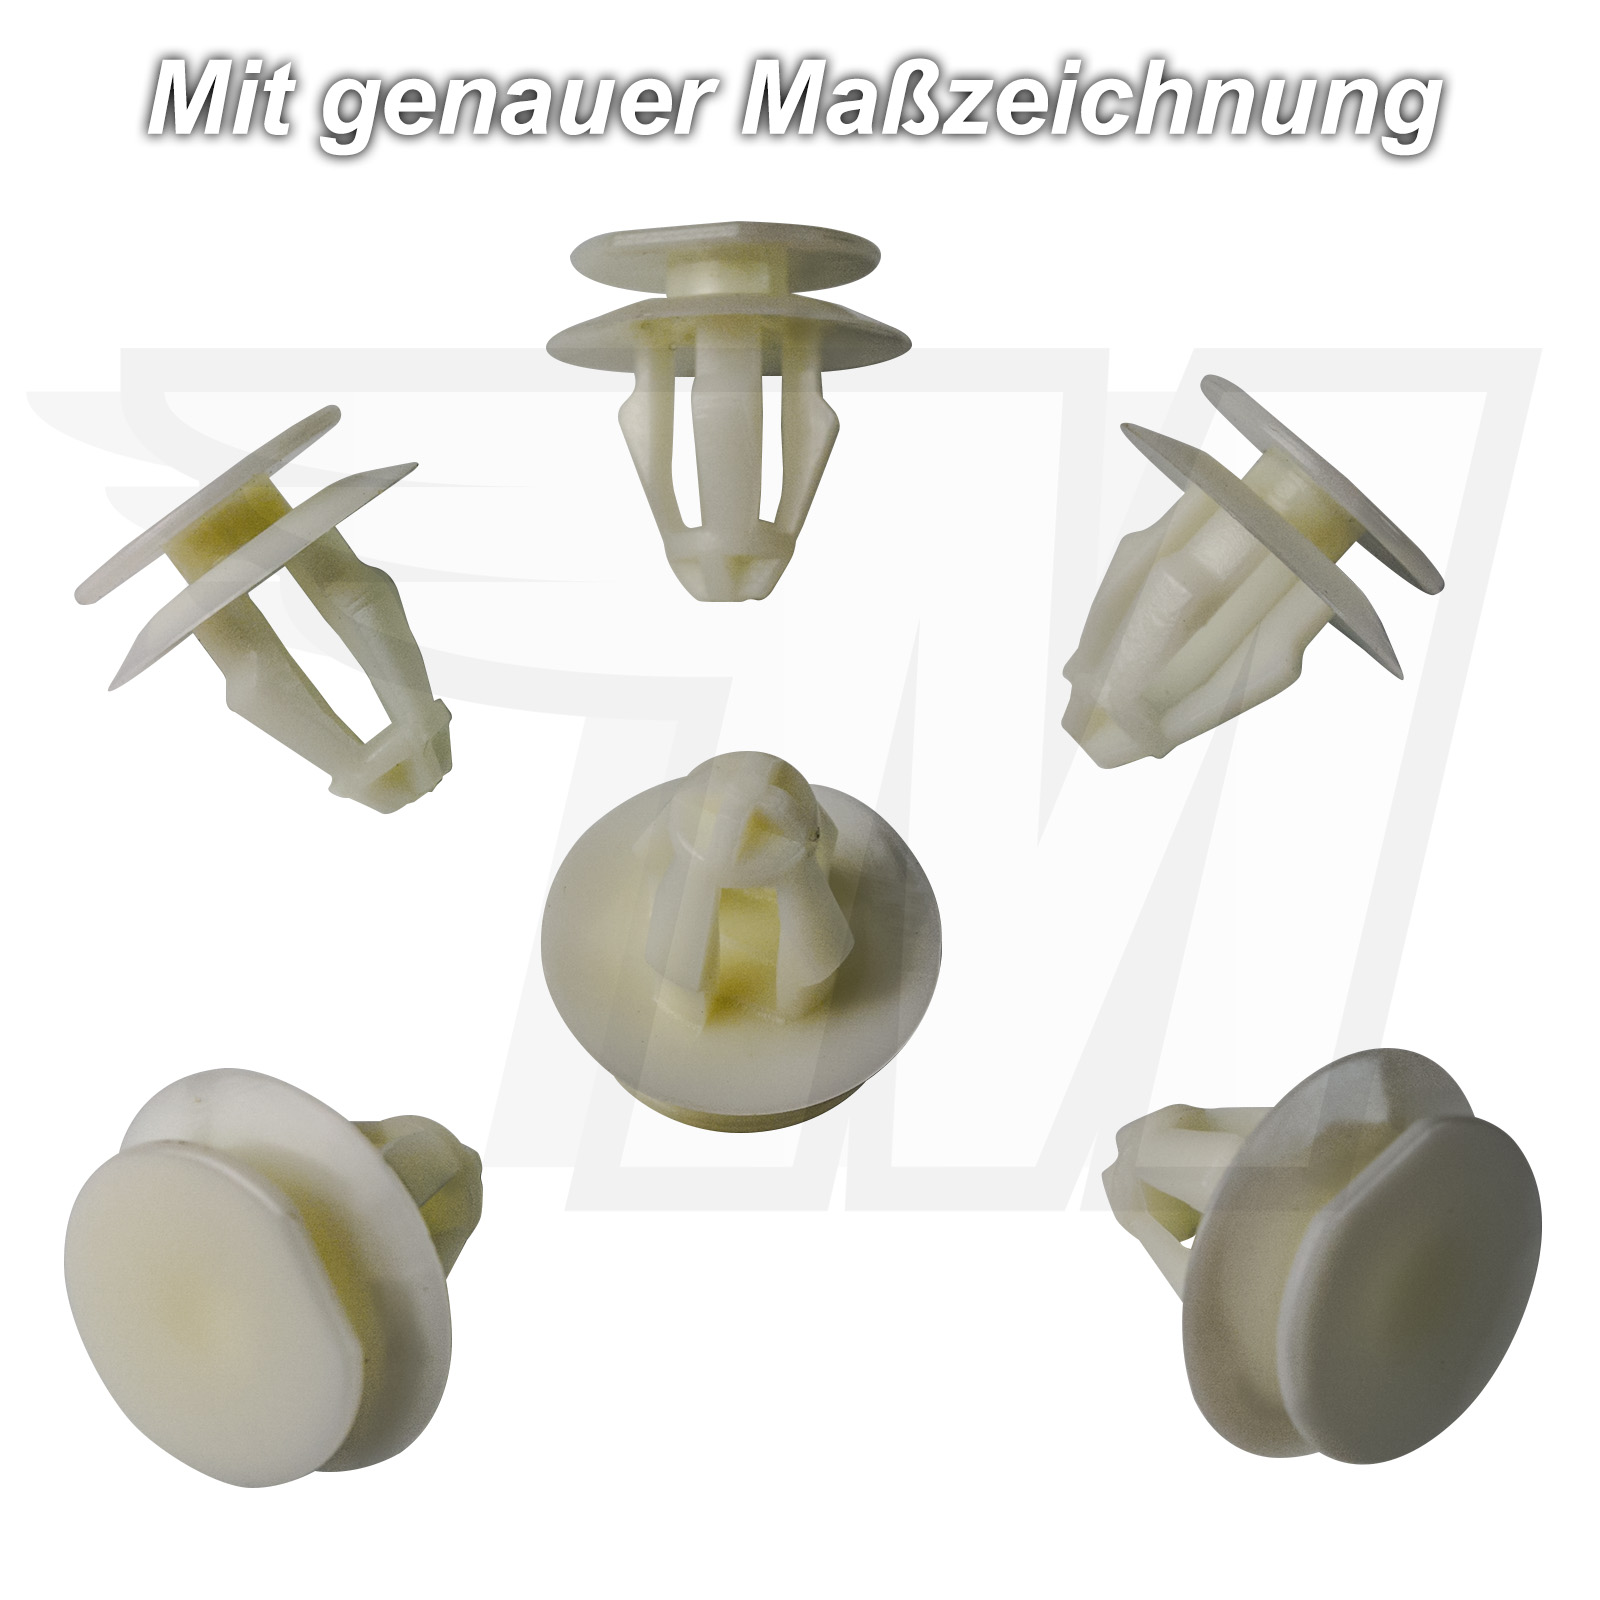 myba de S a0009908592/ 15/X revestimiento interior CLIPS de montaje